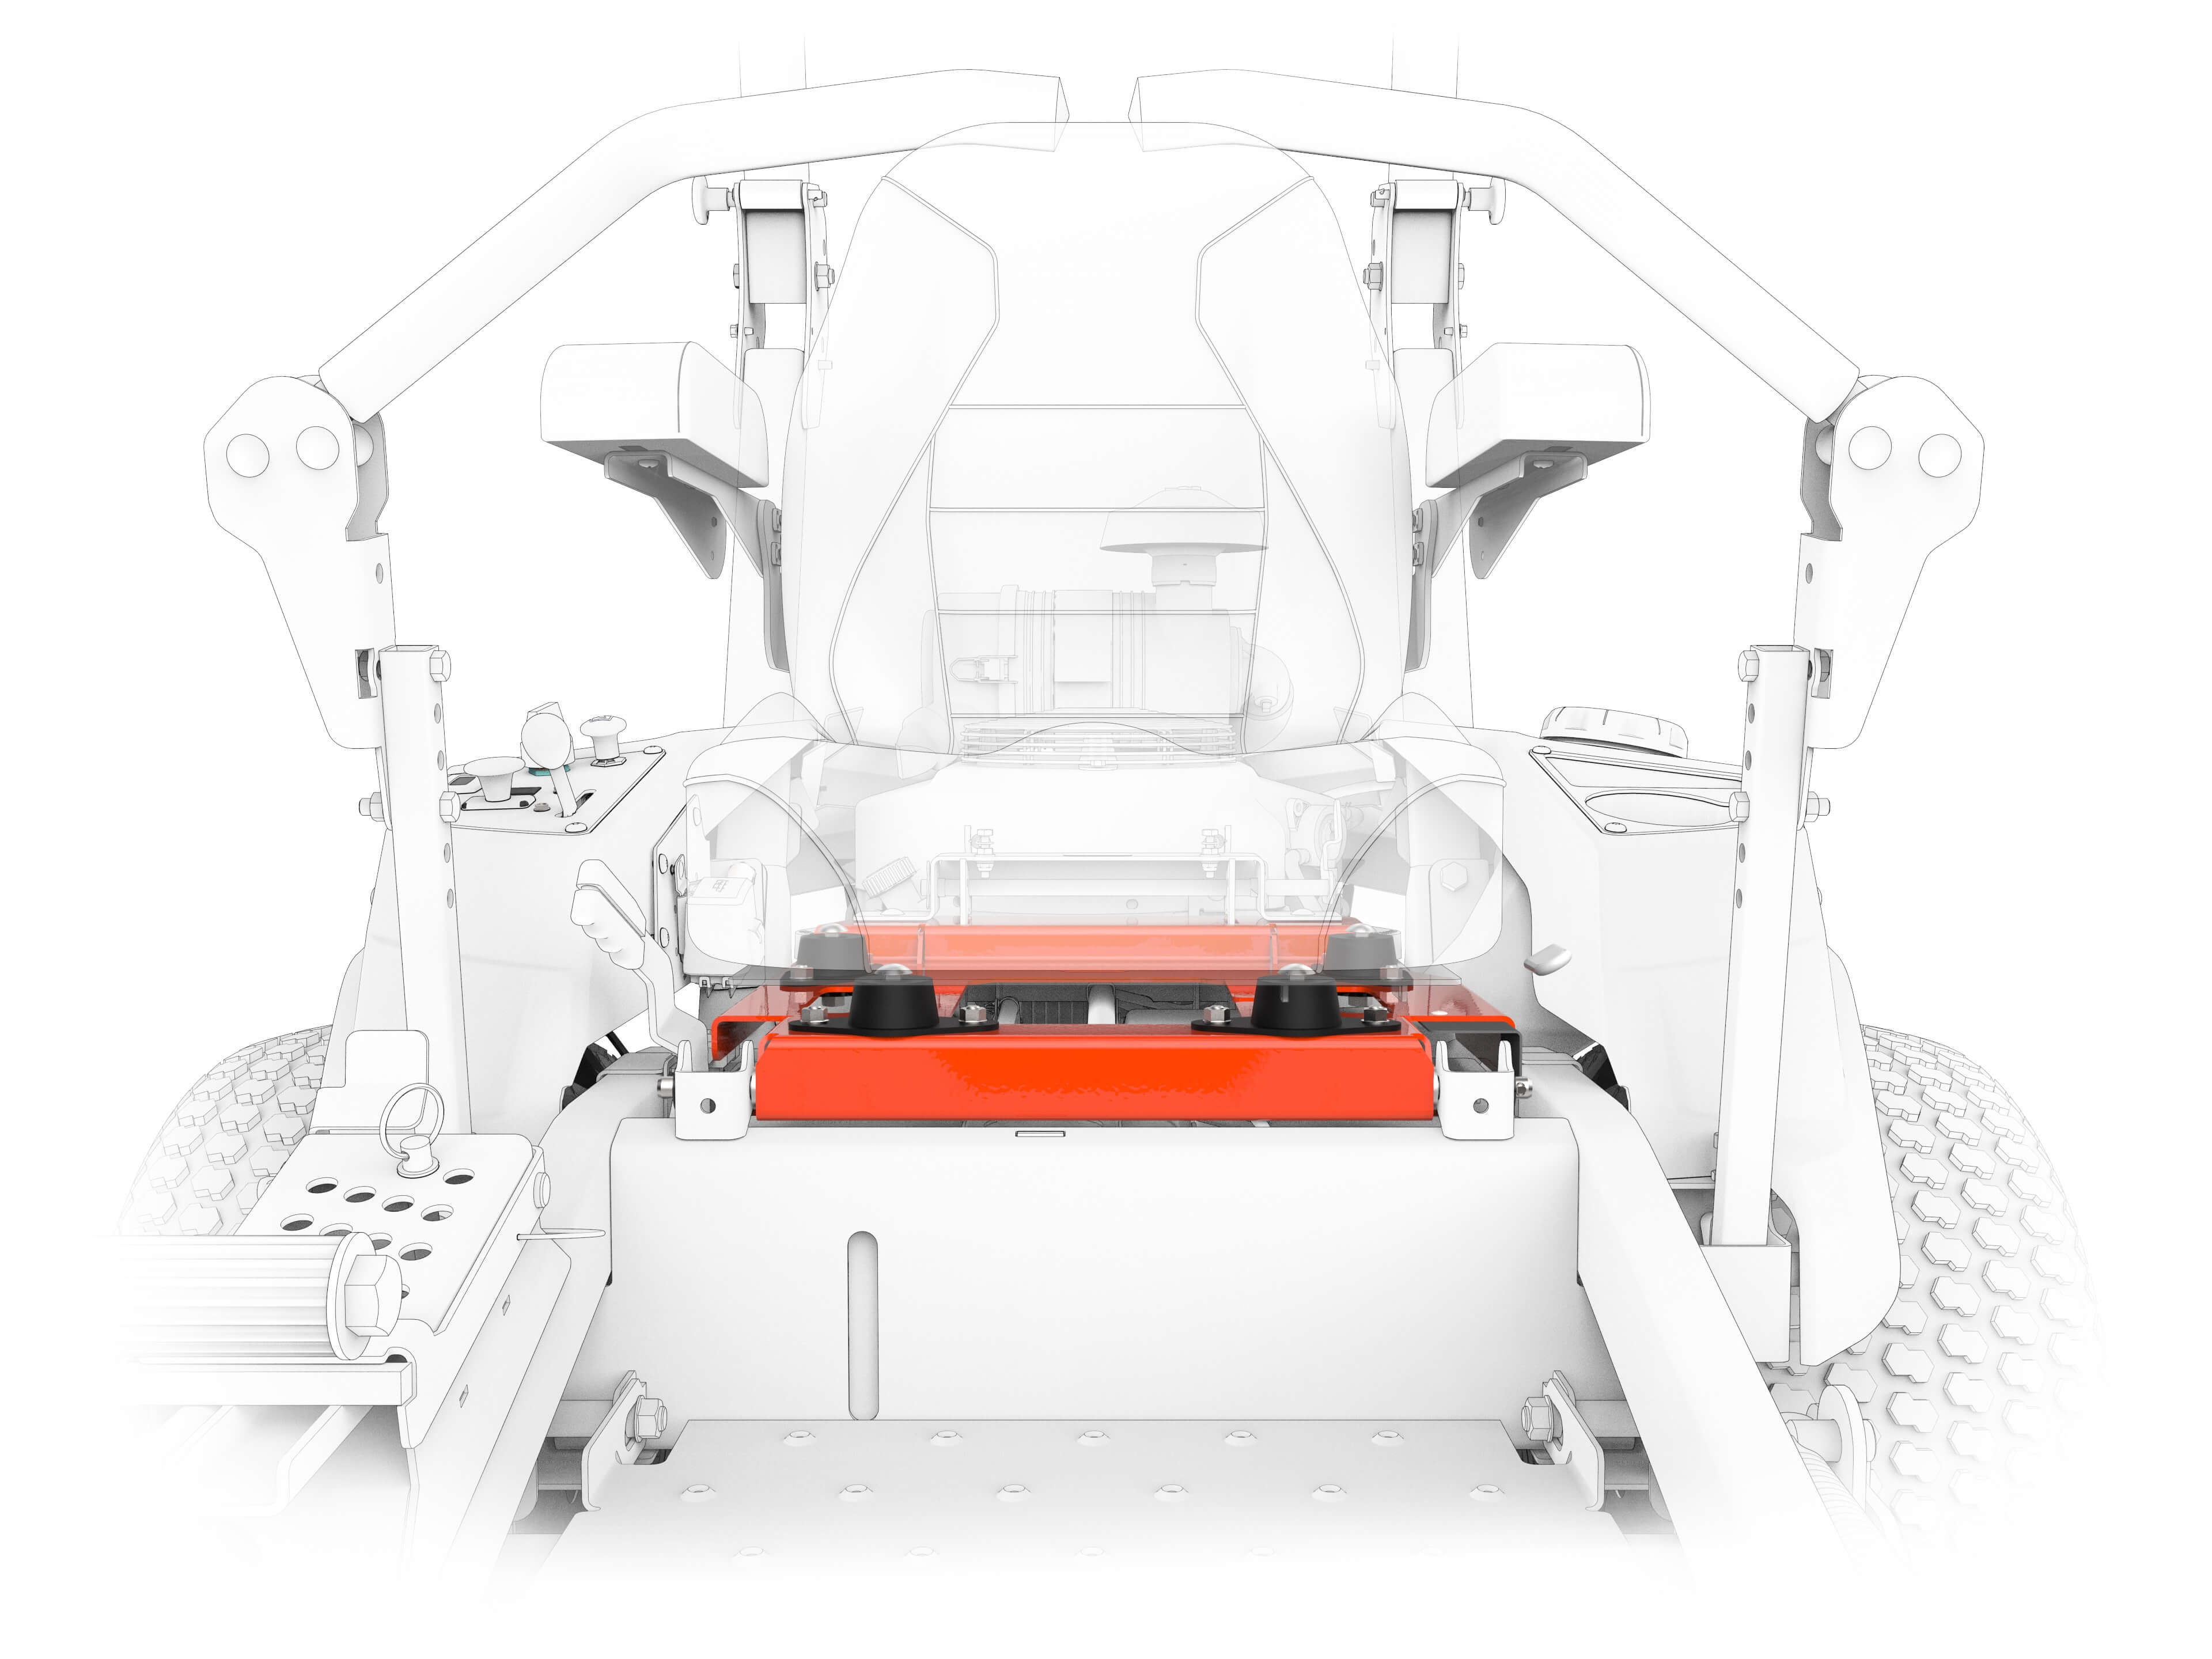 Zero turn Zenith 60 - Seat Isolator